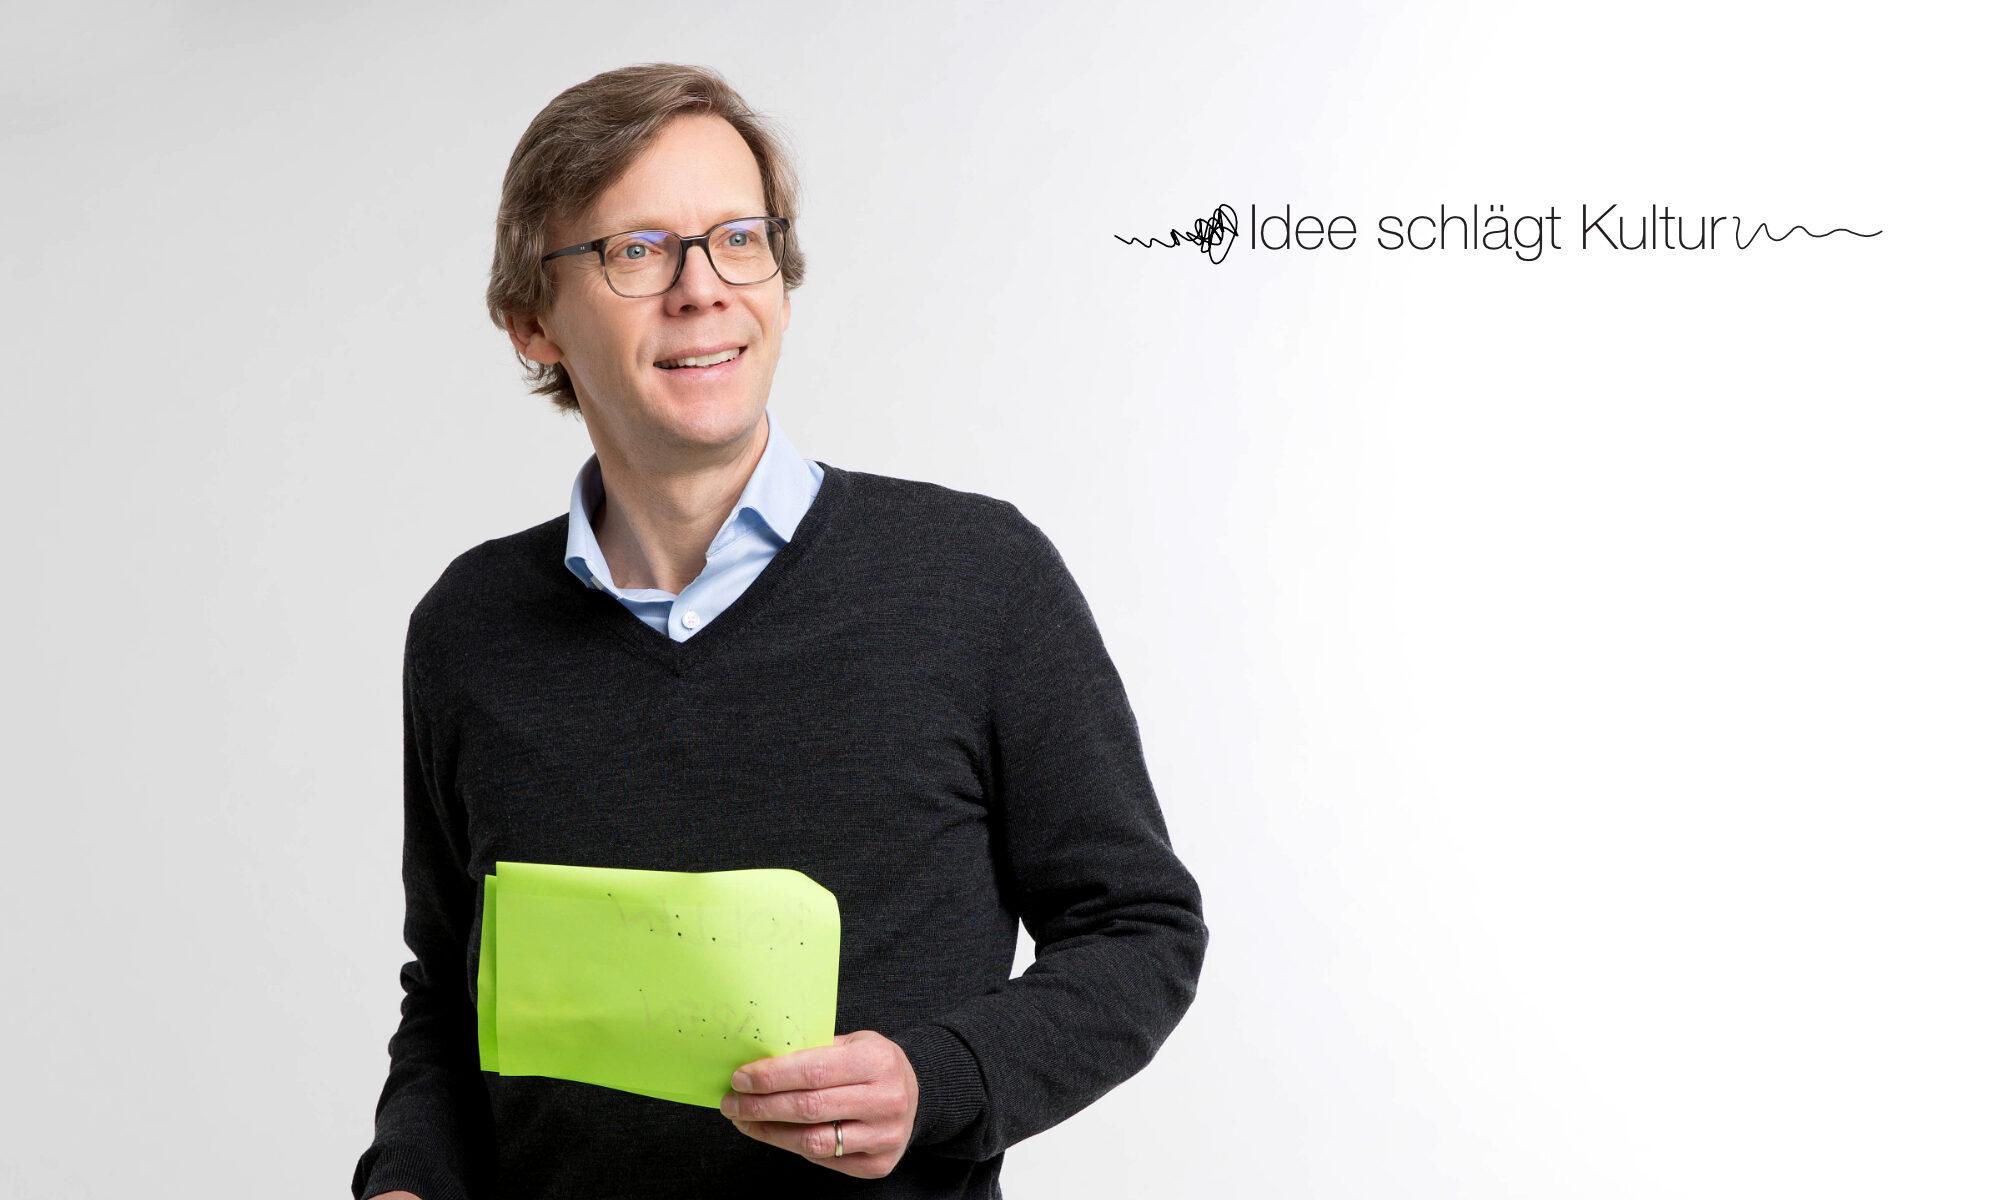 Sebastian Sukstorf